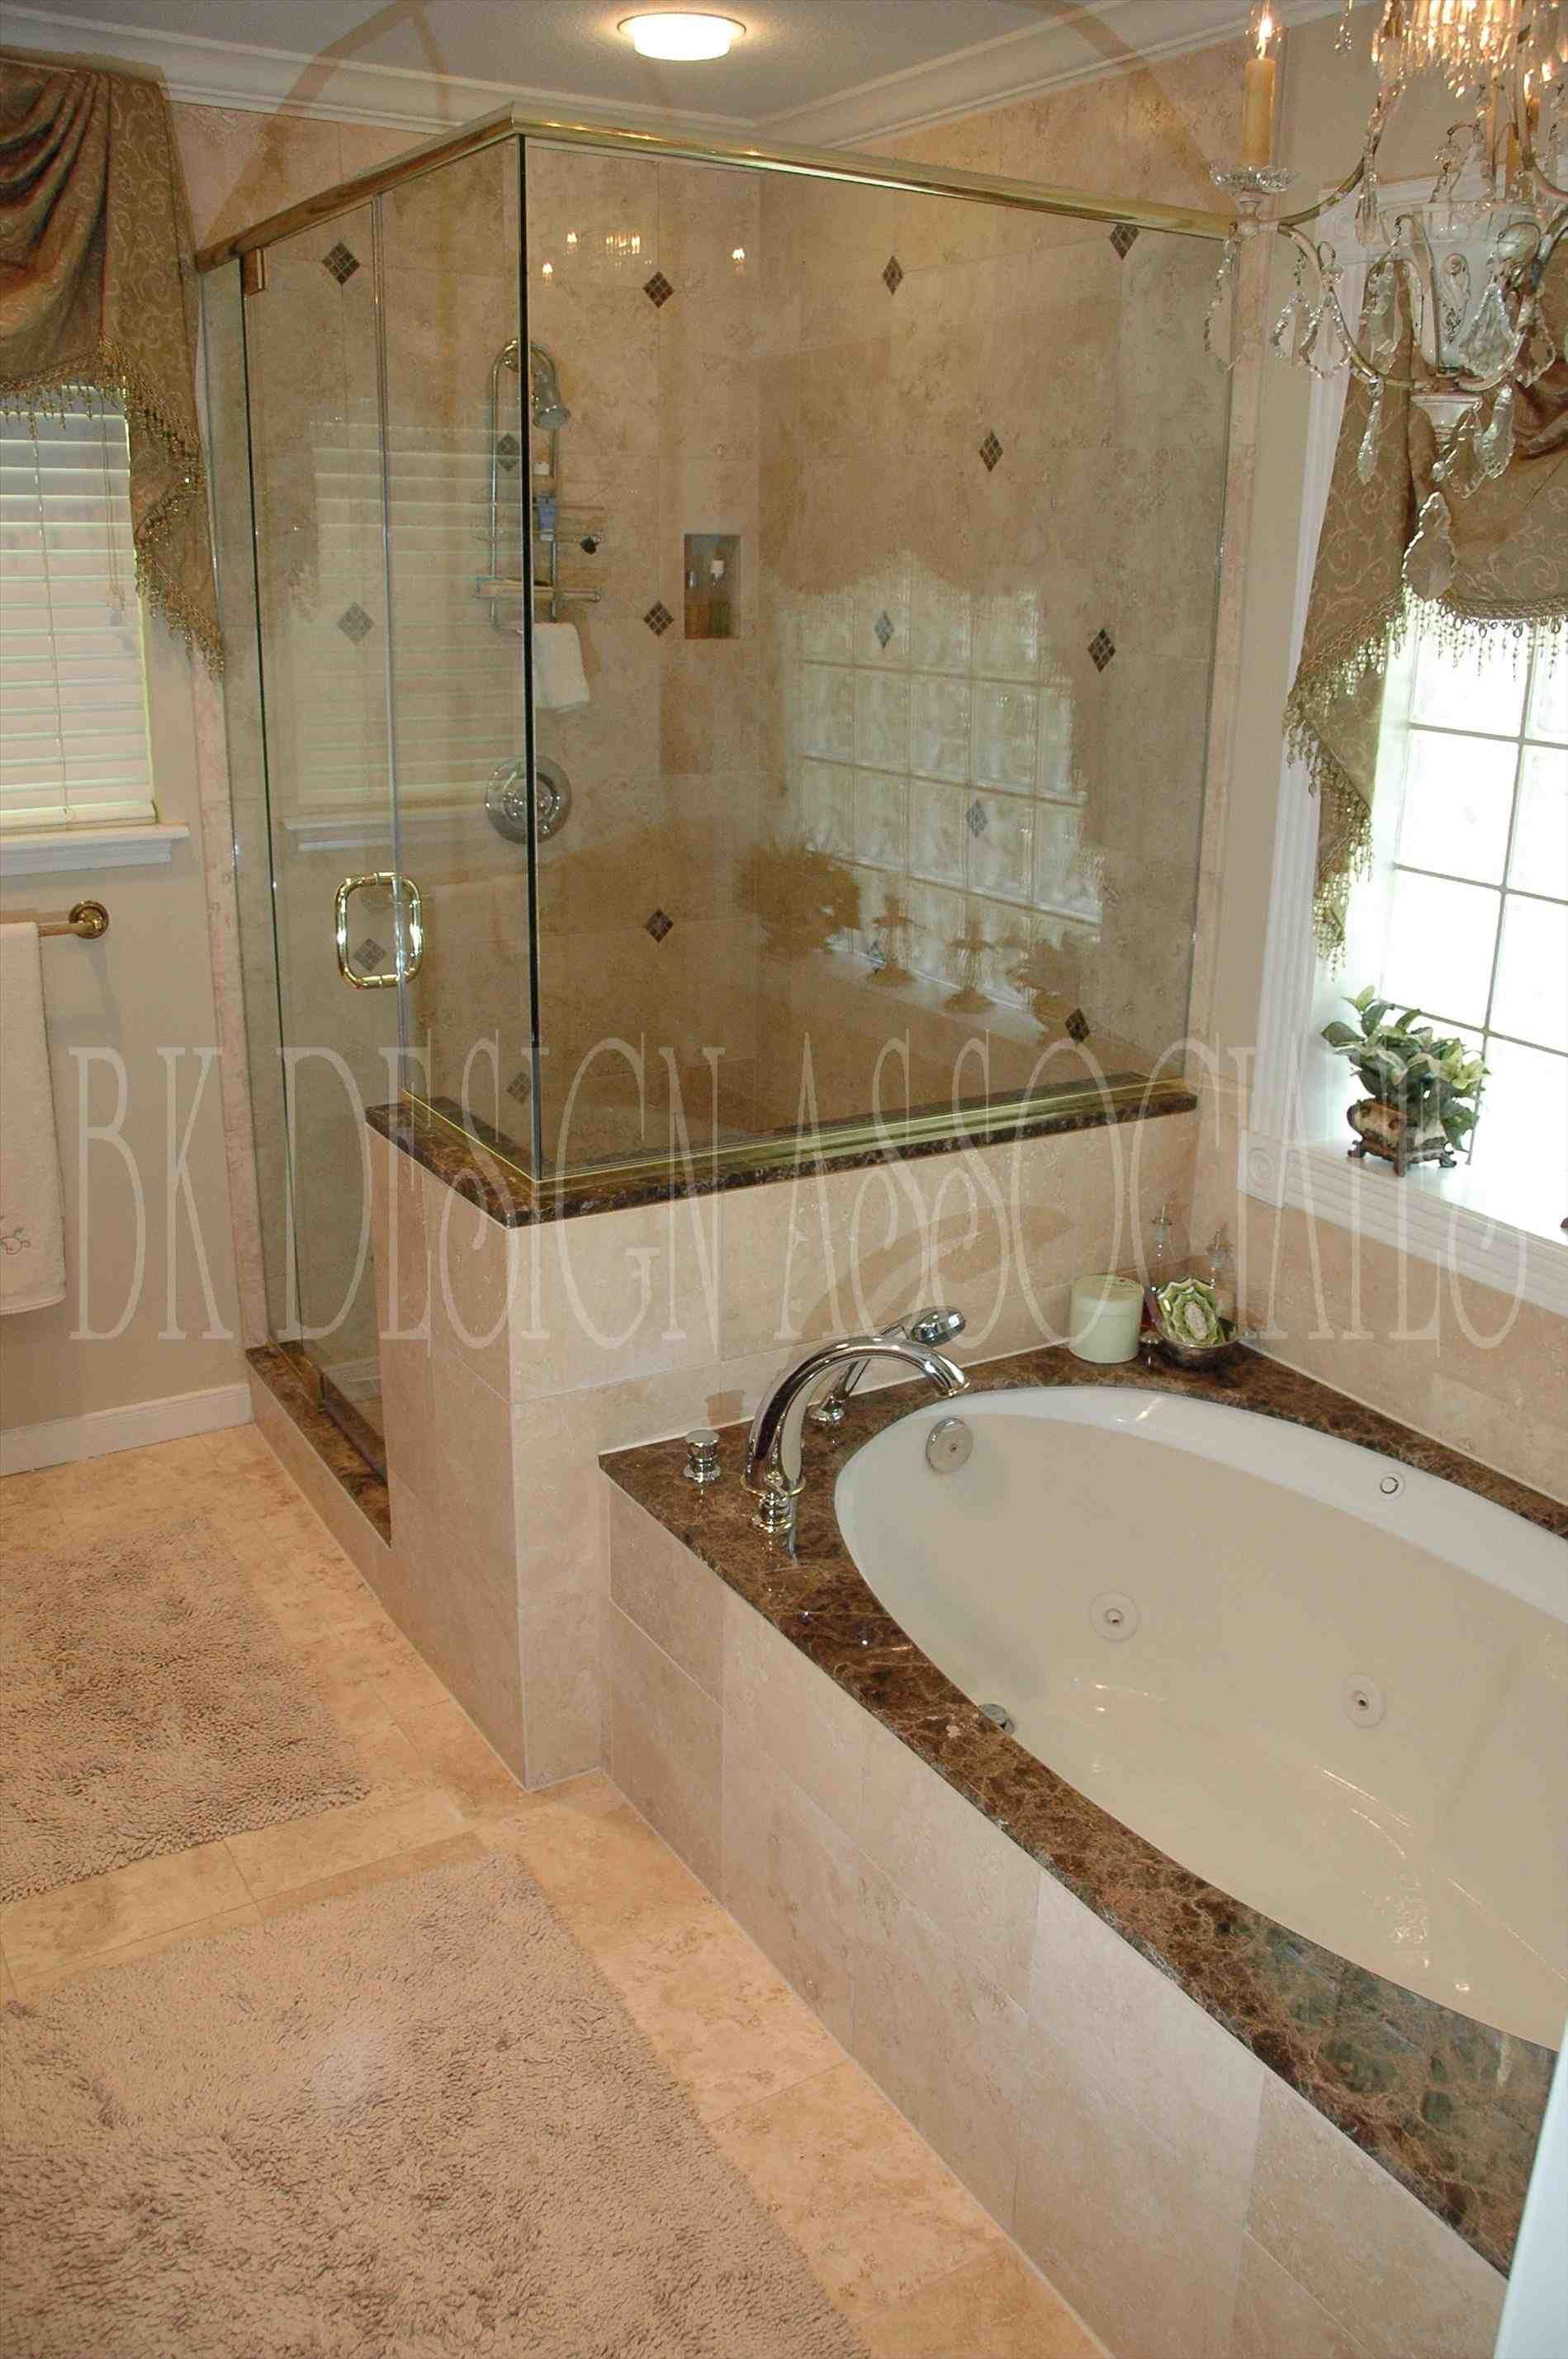 This Bath Shower Combo Small Bathroom Design For Small Bathroom With Tub Design For Small Ba Master Bathroom Shower Bathroom Tub Shower Combo Bathroom Design